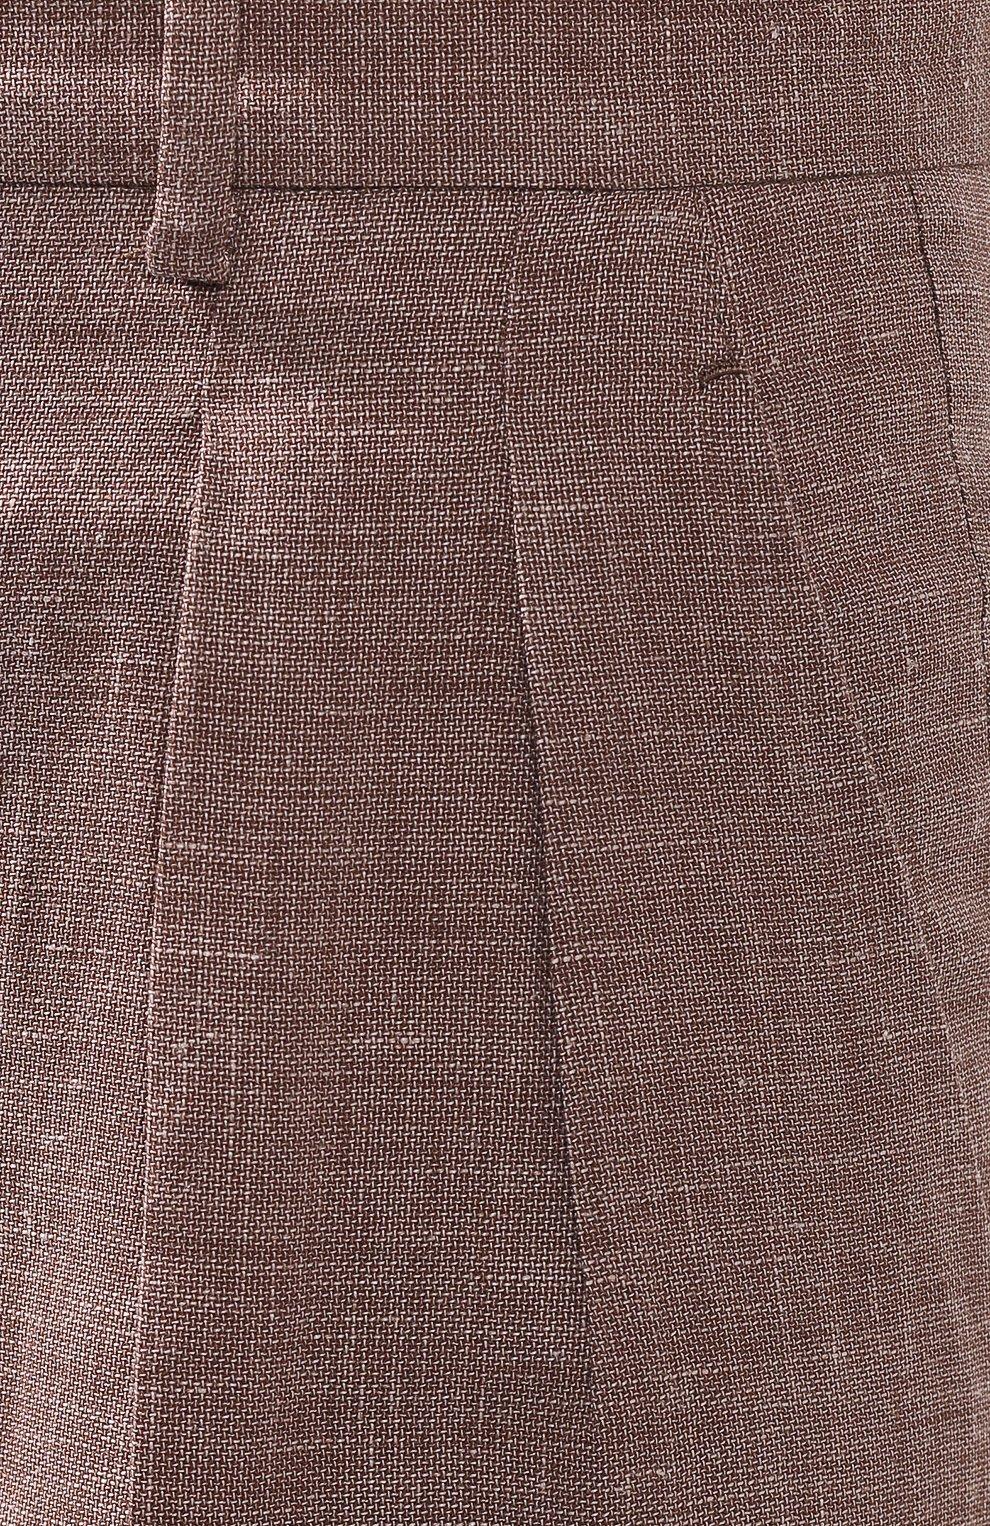 Женские брюки с отворотами KITON коричневого цвета, арт. D47119K06P19 | Фото 5